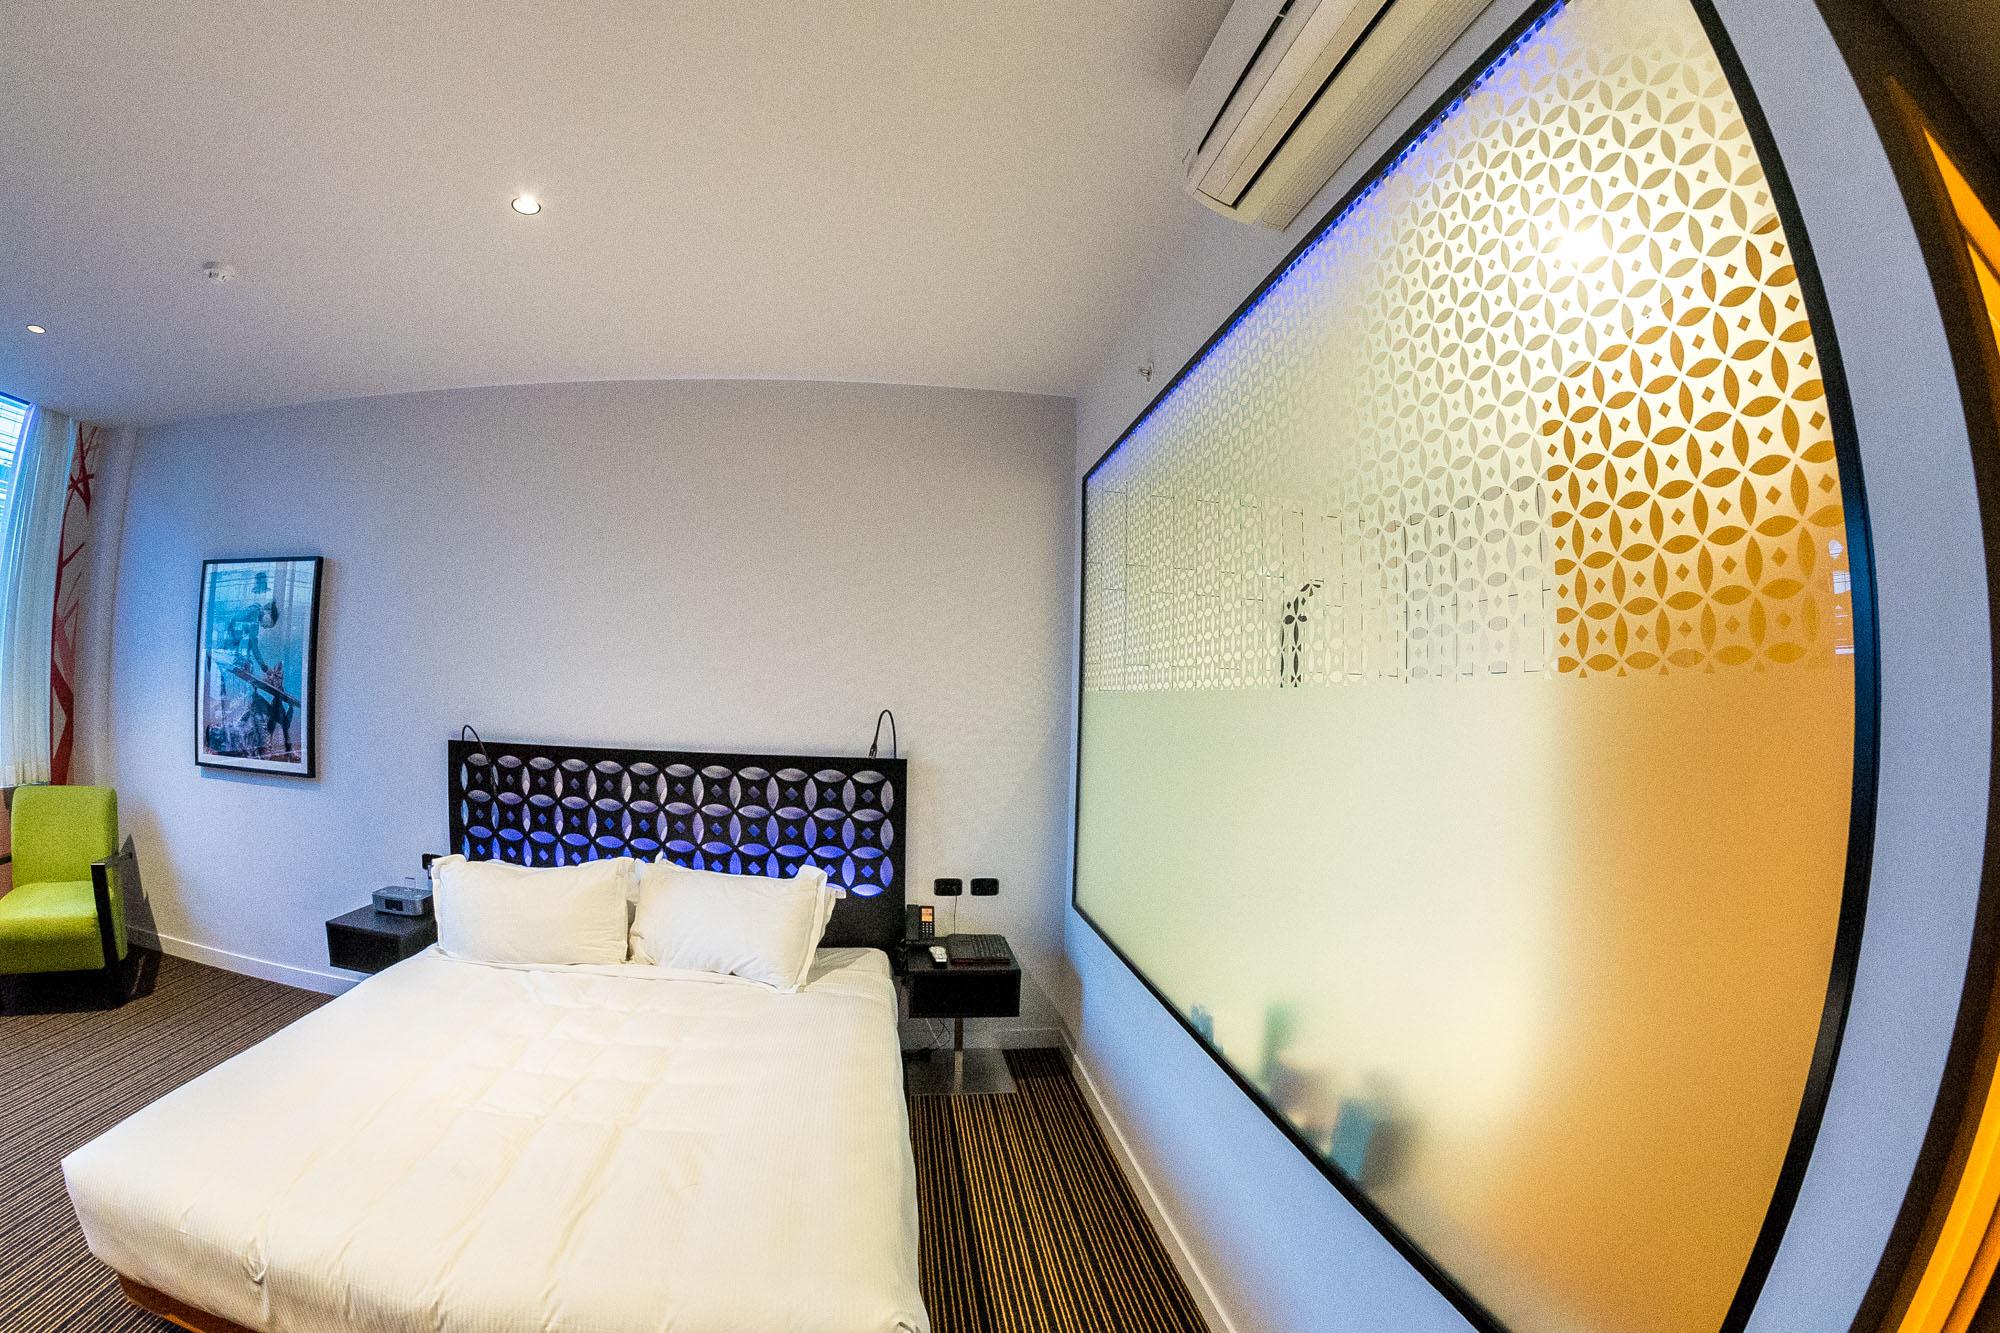 brisbane-tryp-hotel-chur-up-15